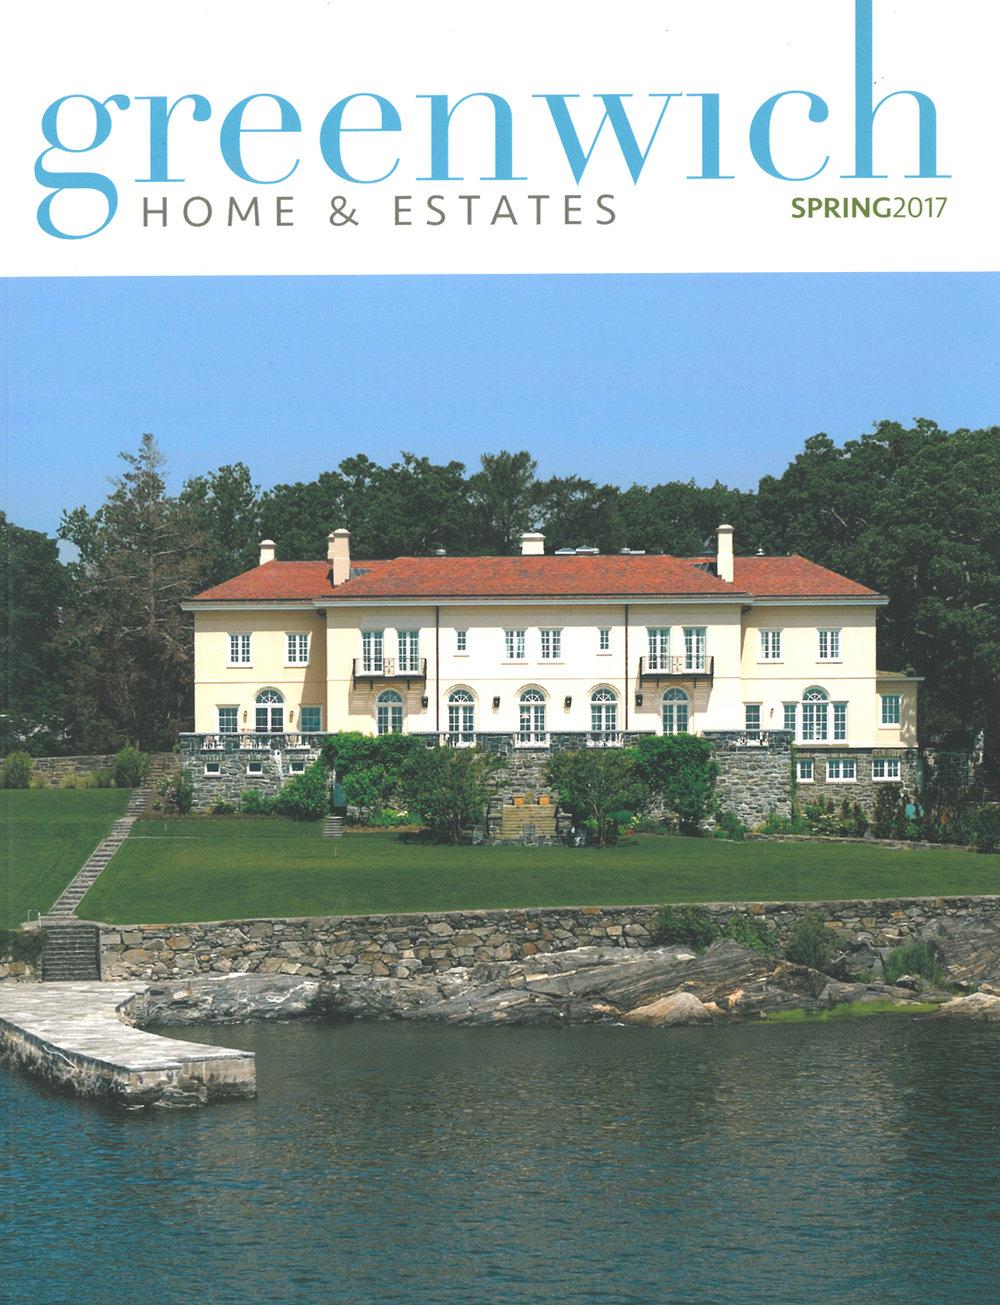 Greenwich Home & Estates Spinrg 2017